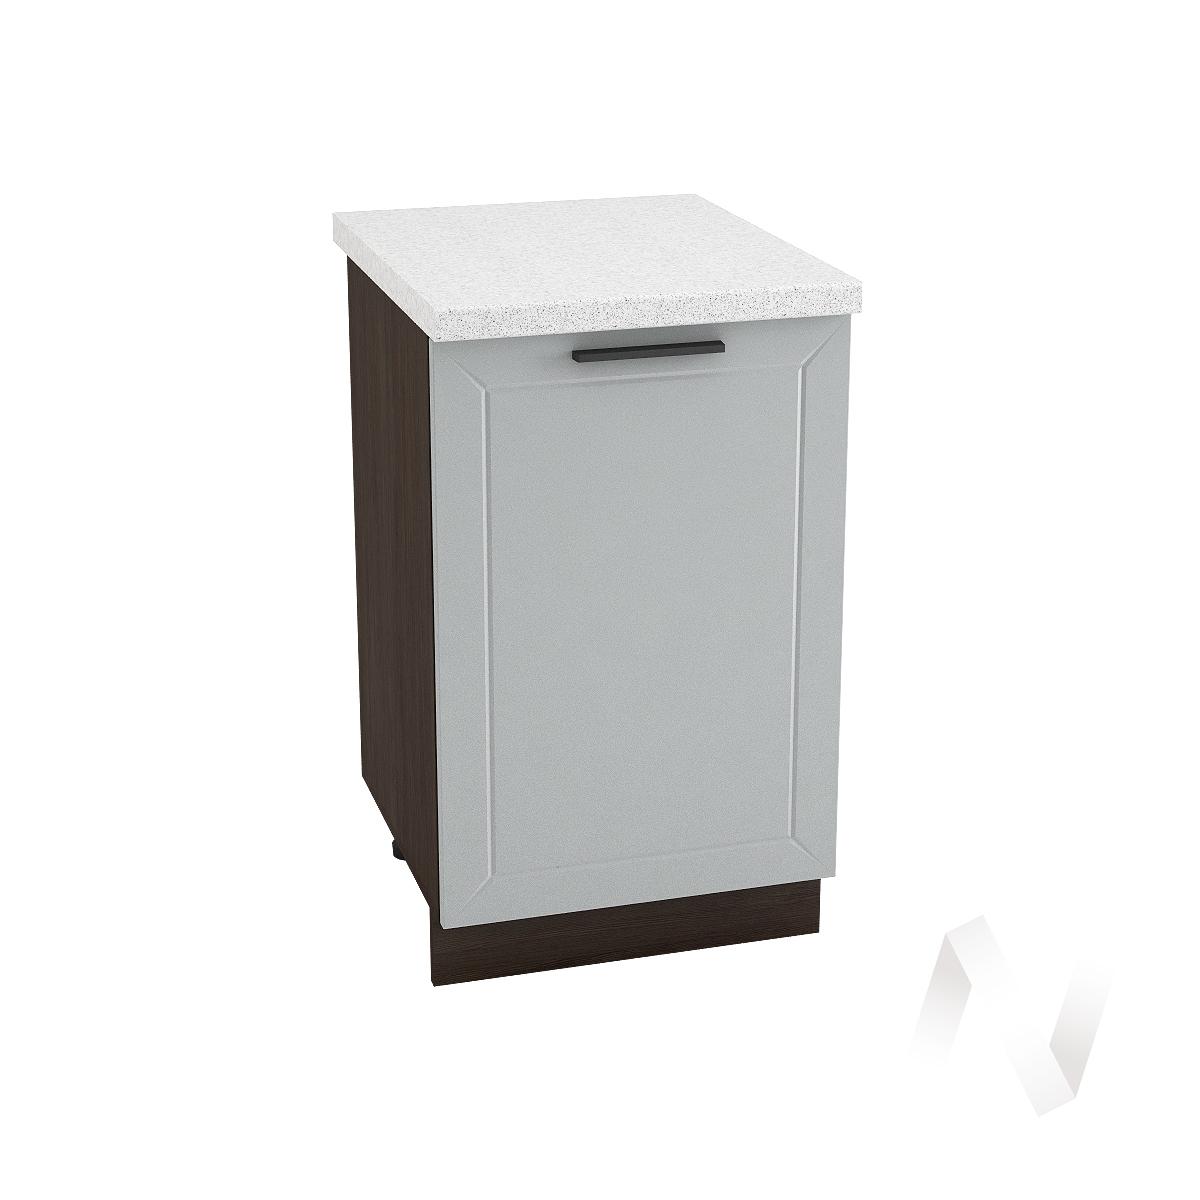 "Кухня ""Глетчер"": Шкаф нижний 500, ШН 500 (Гейнсборо Силк/корпус венге)"